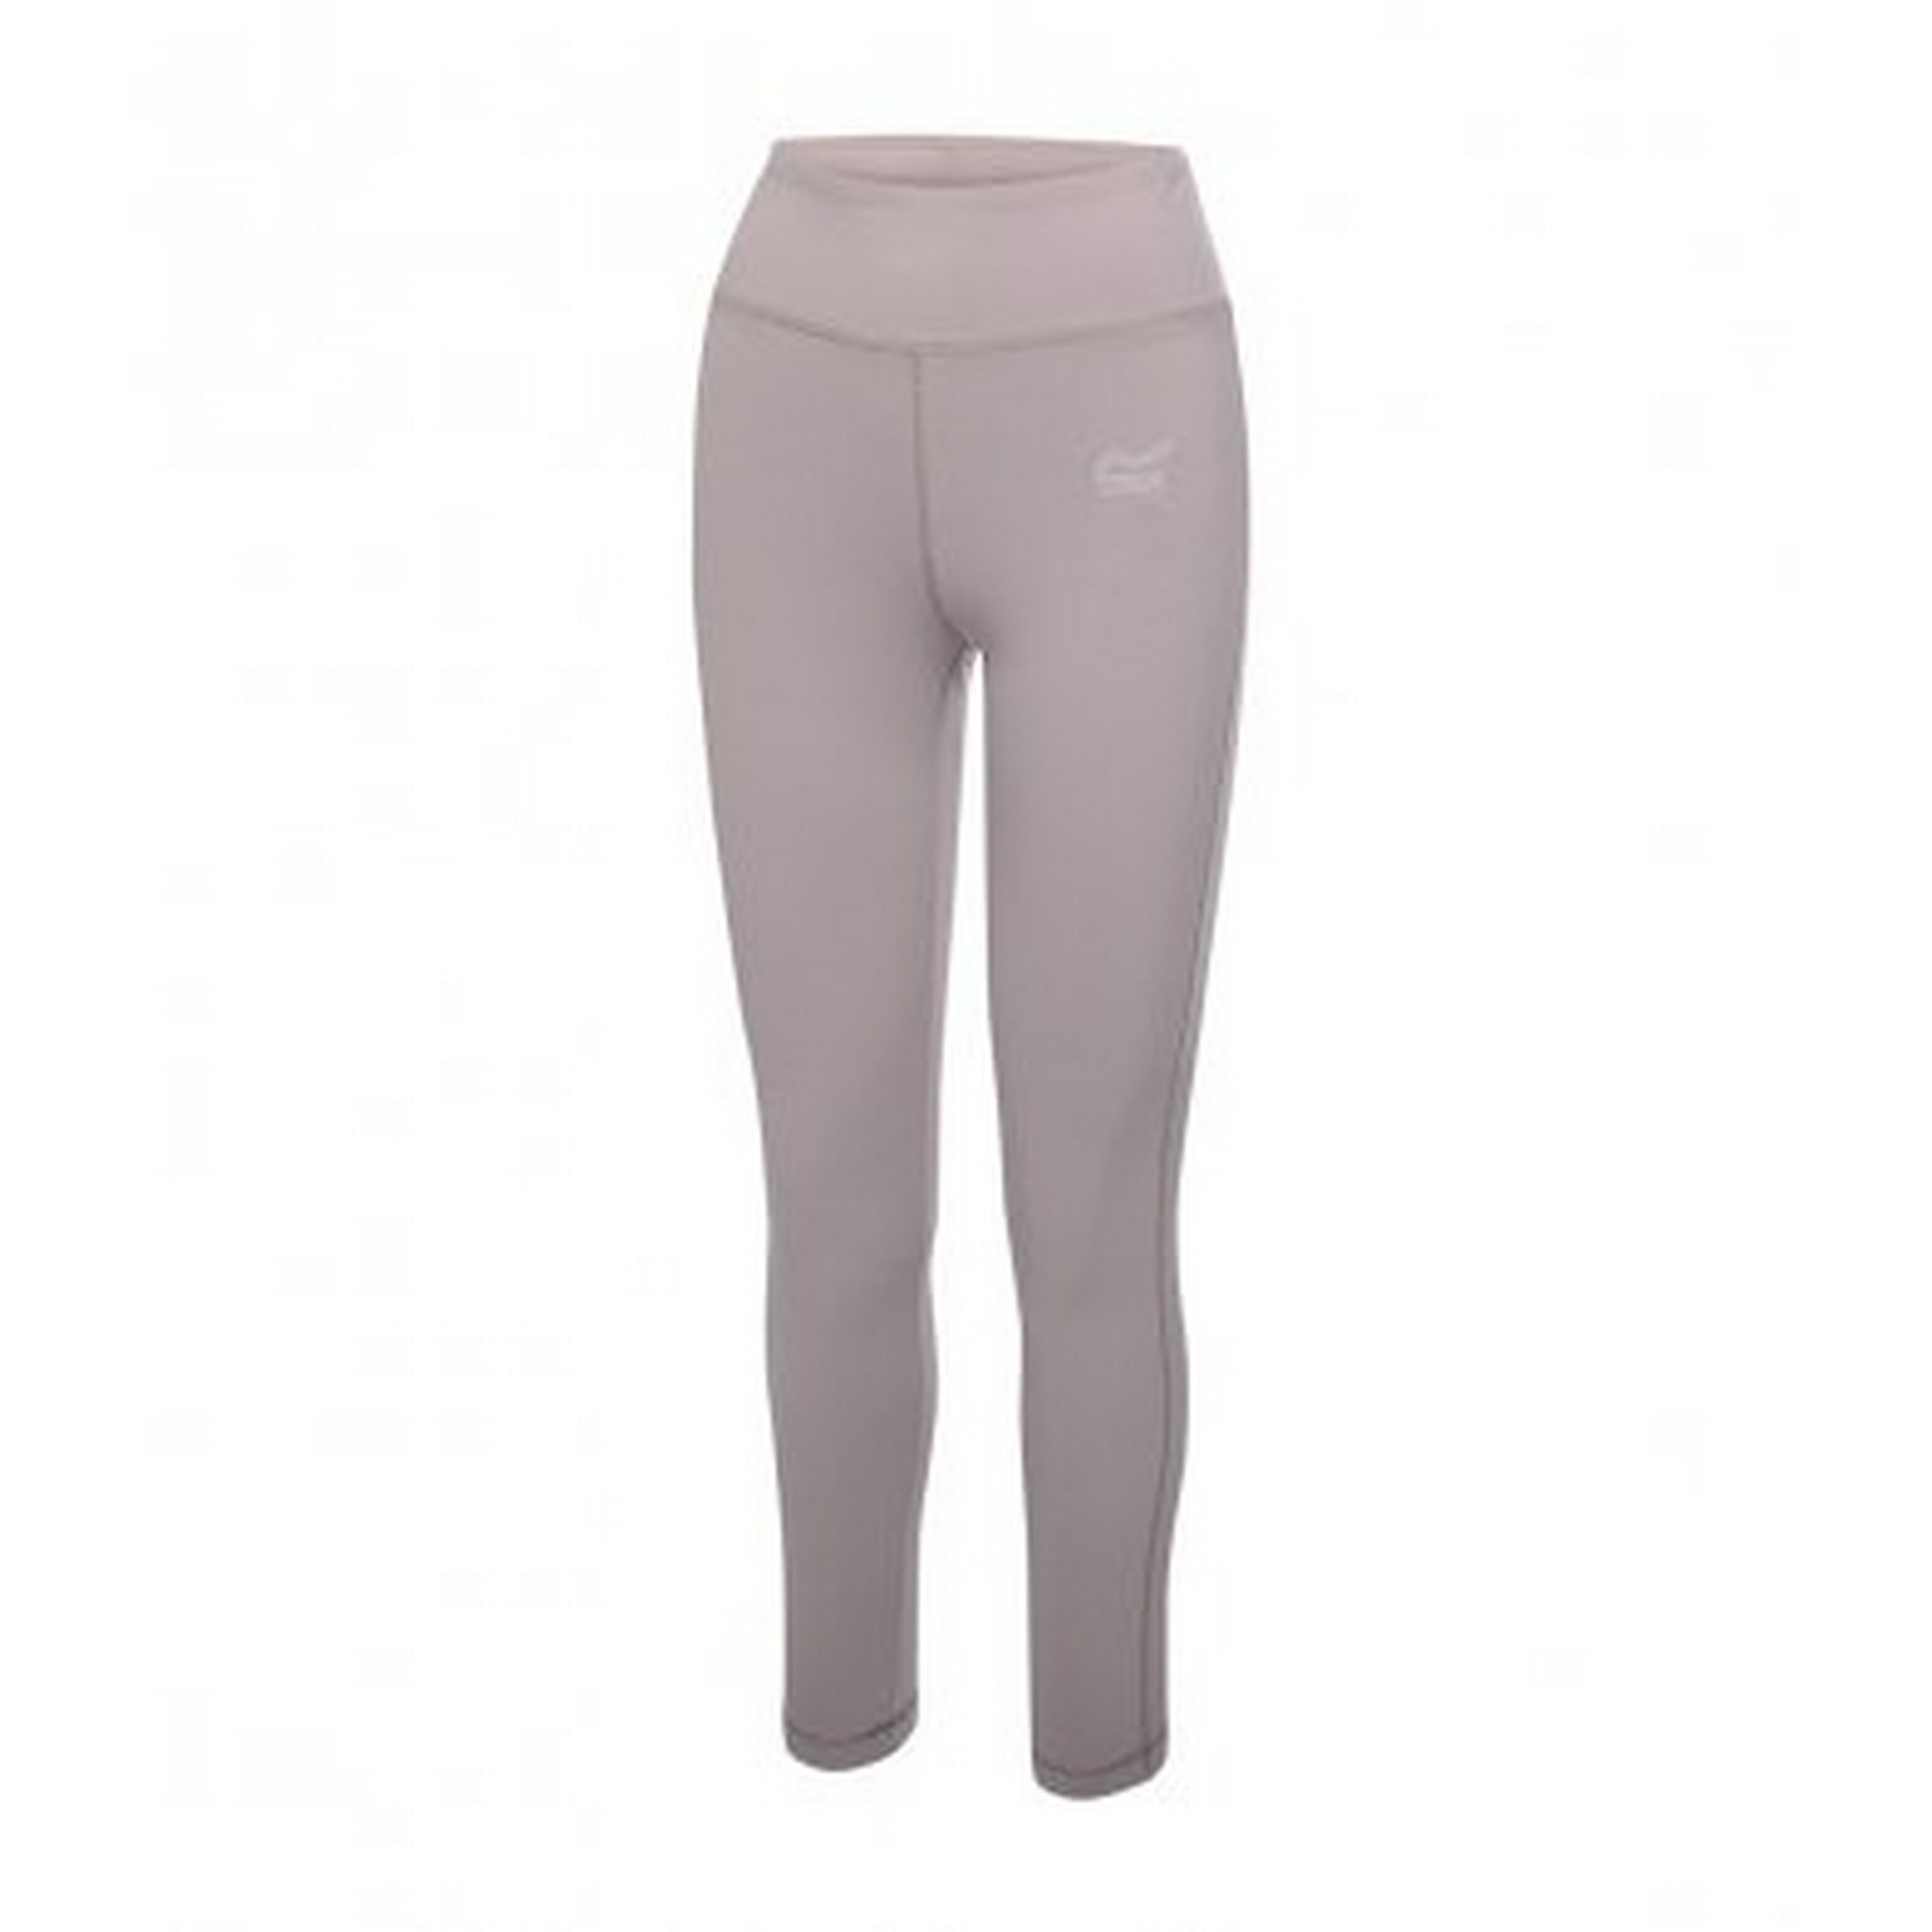 Regatta-Activewear-Leggings-modelo-Pincha-para-mujer-PC3118